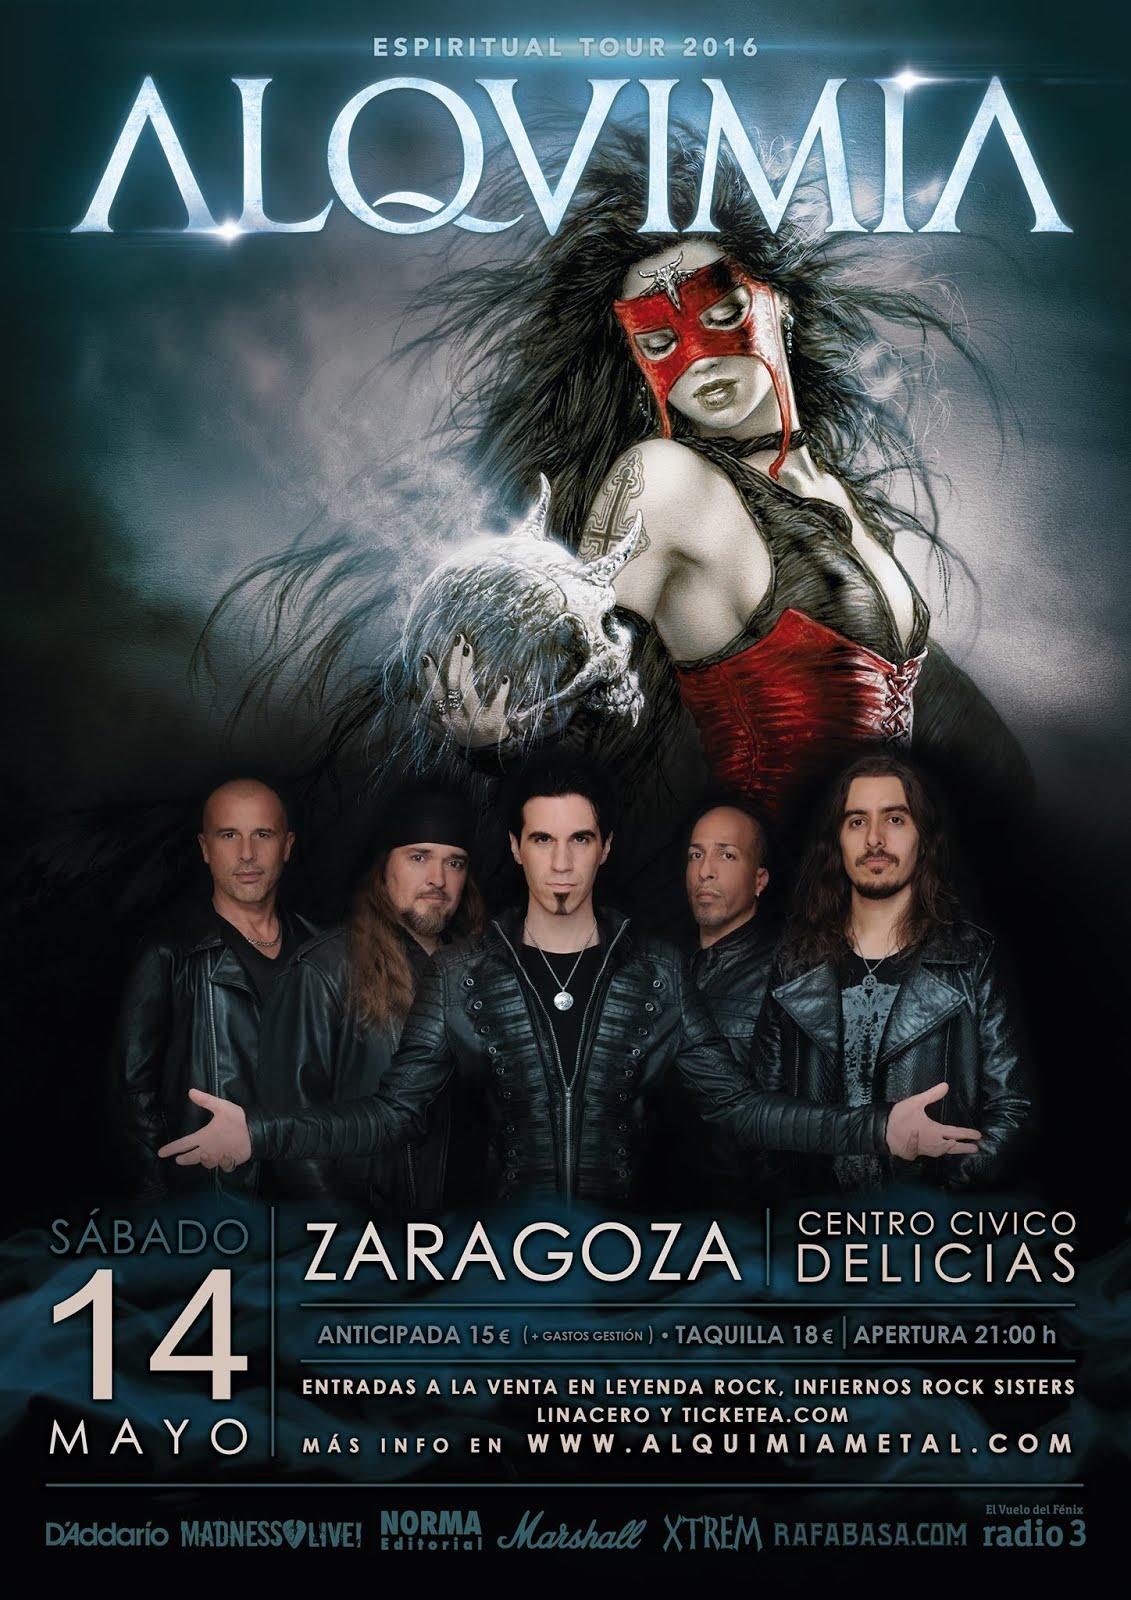 14 de mayo (Zaragoza)